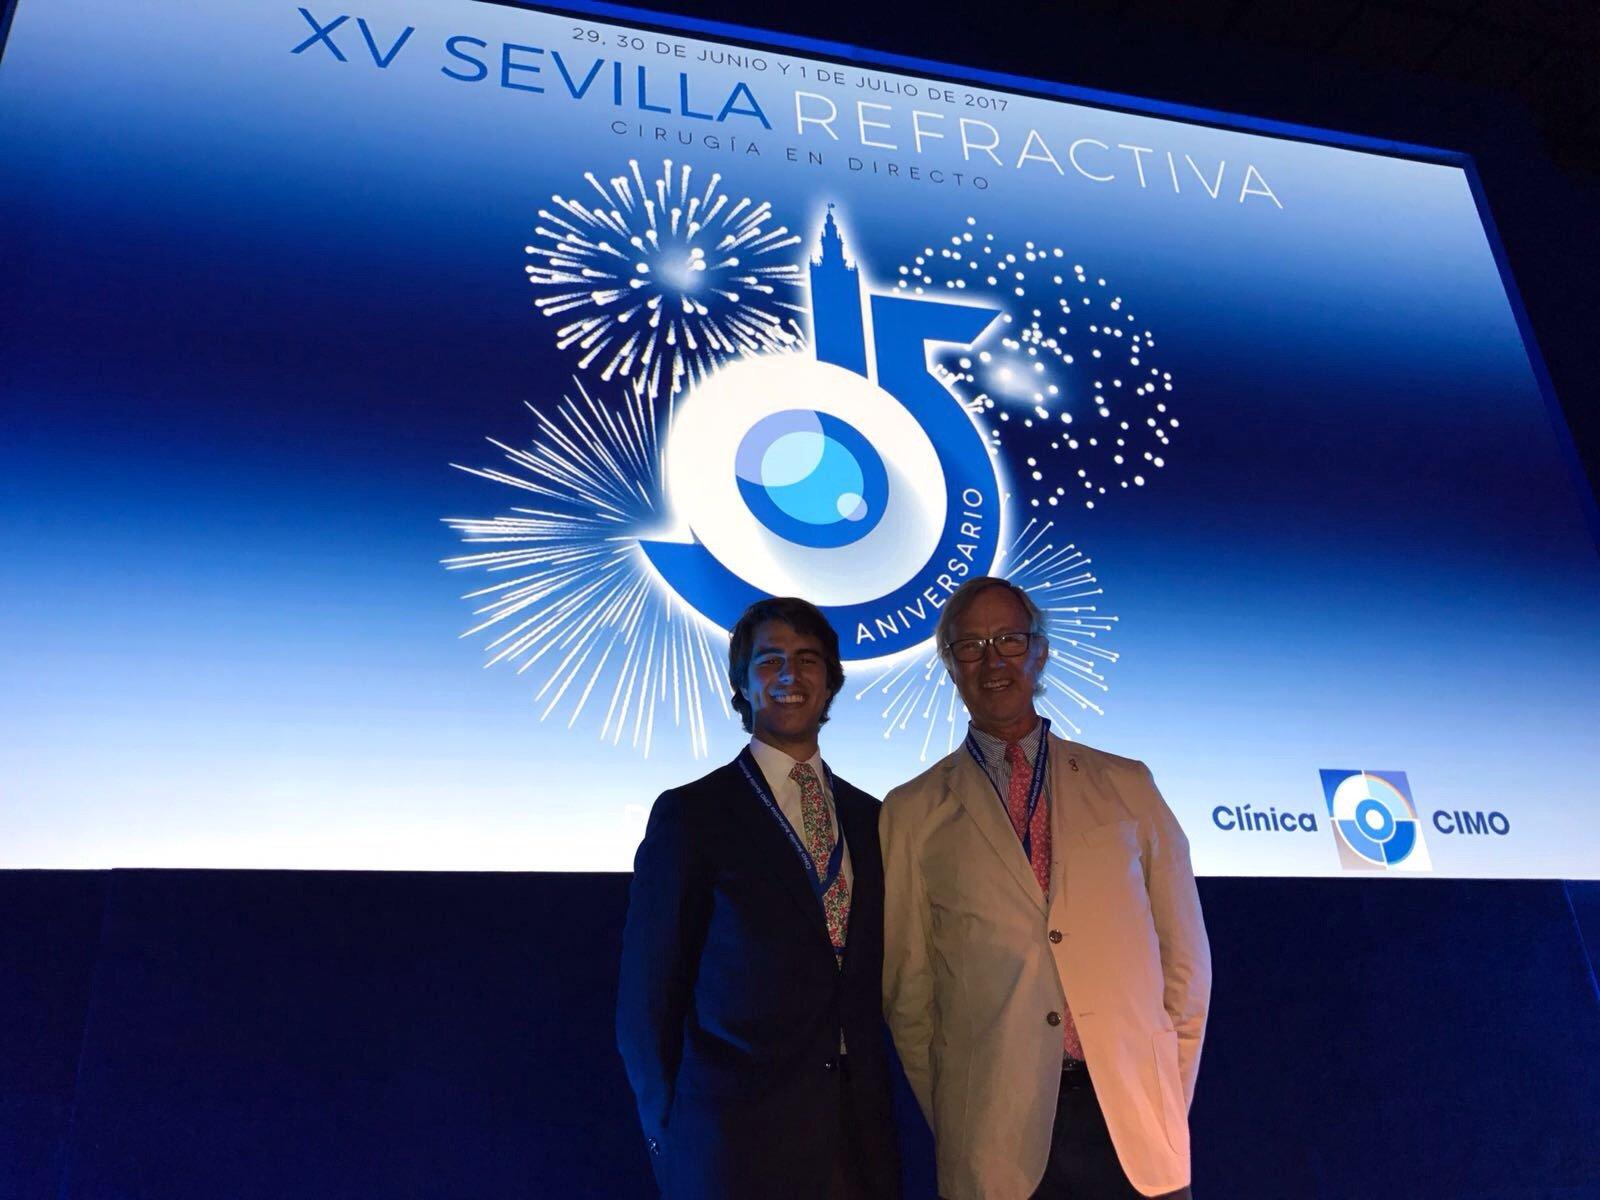 "DRS GARCÍA DE OTEYZA PARTICIPATE ACTIVELY AT ""SEVILLA REFRACTIVA"""